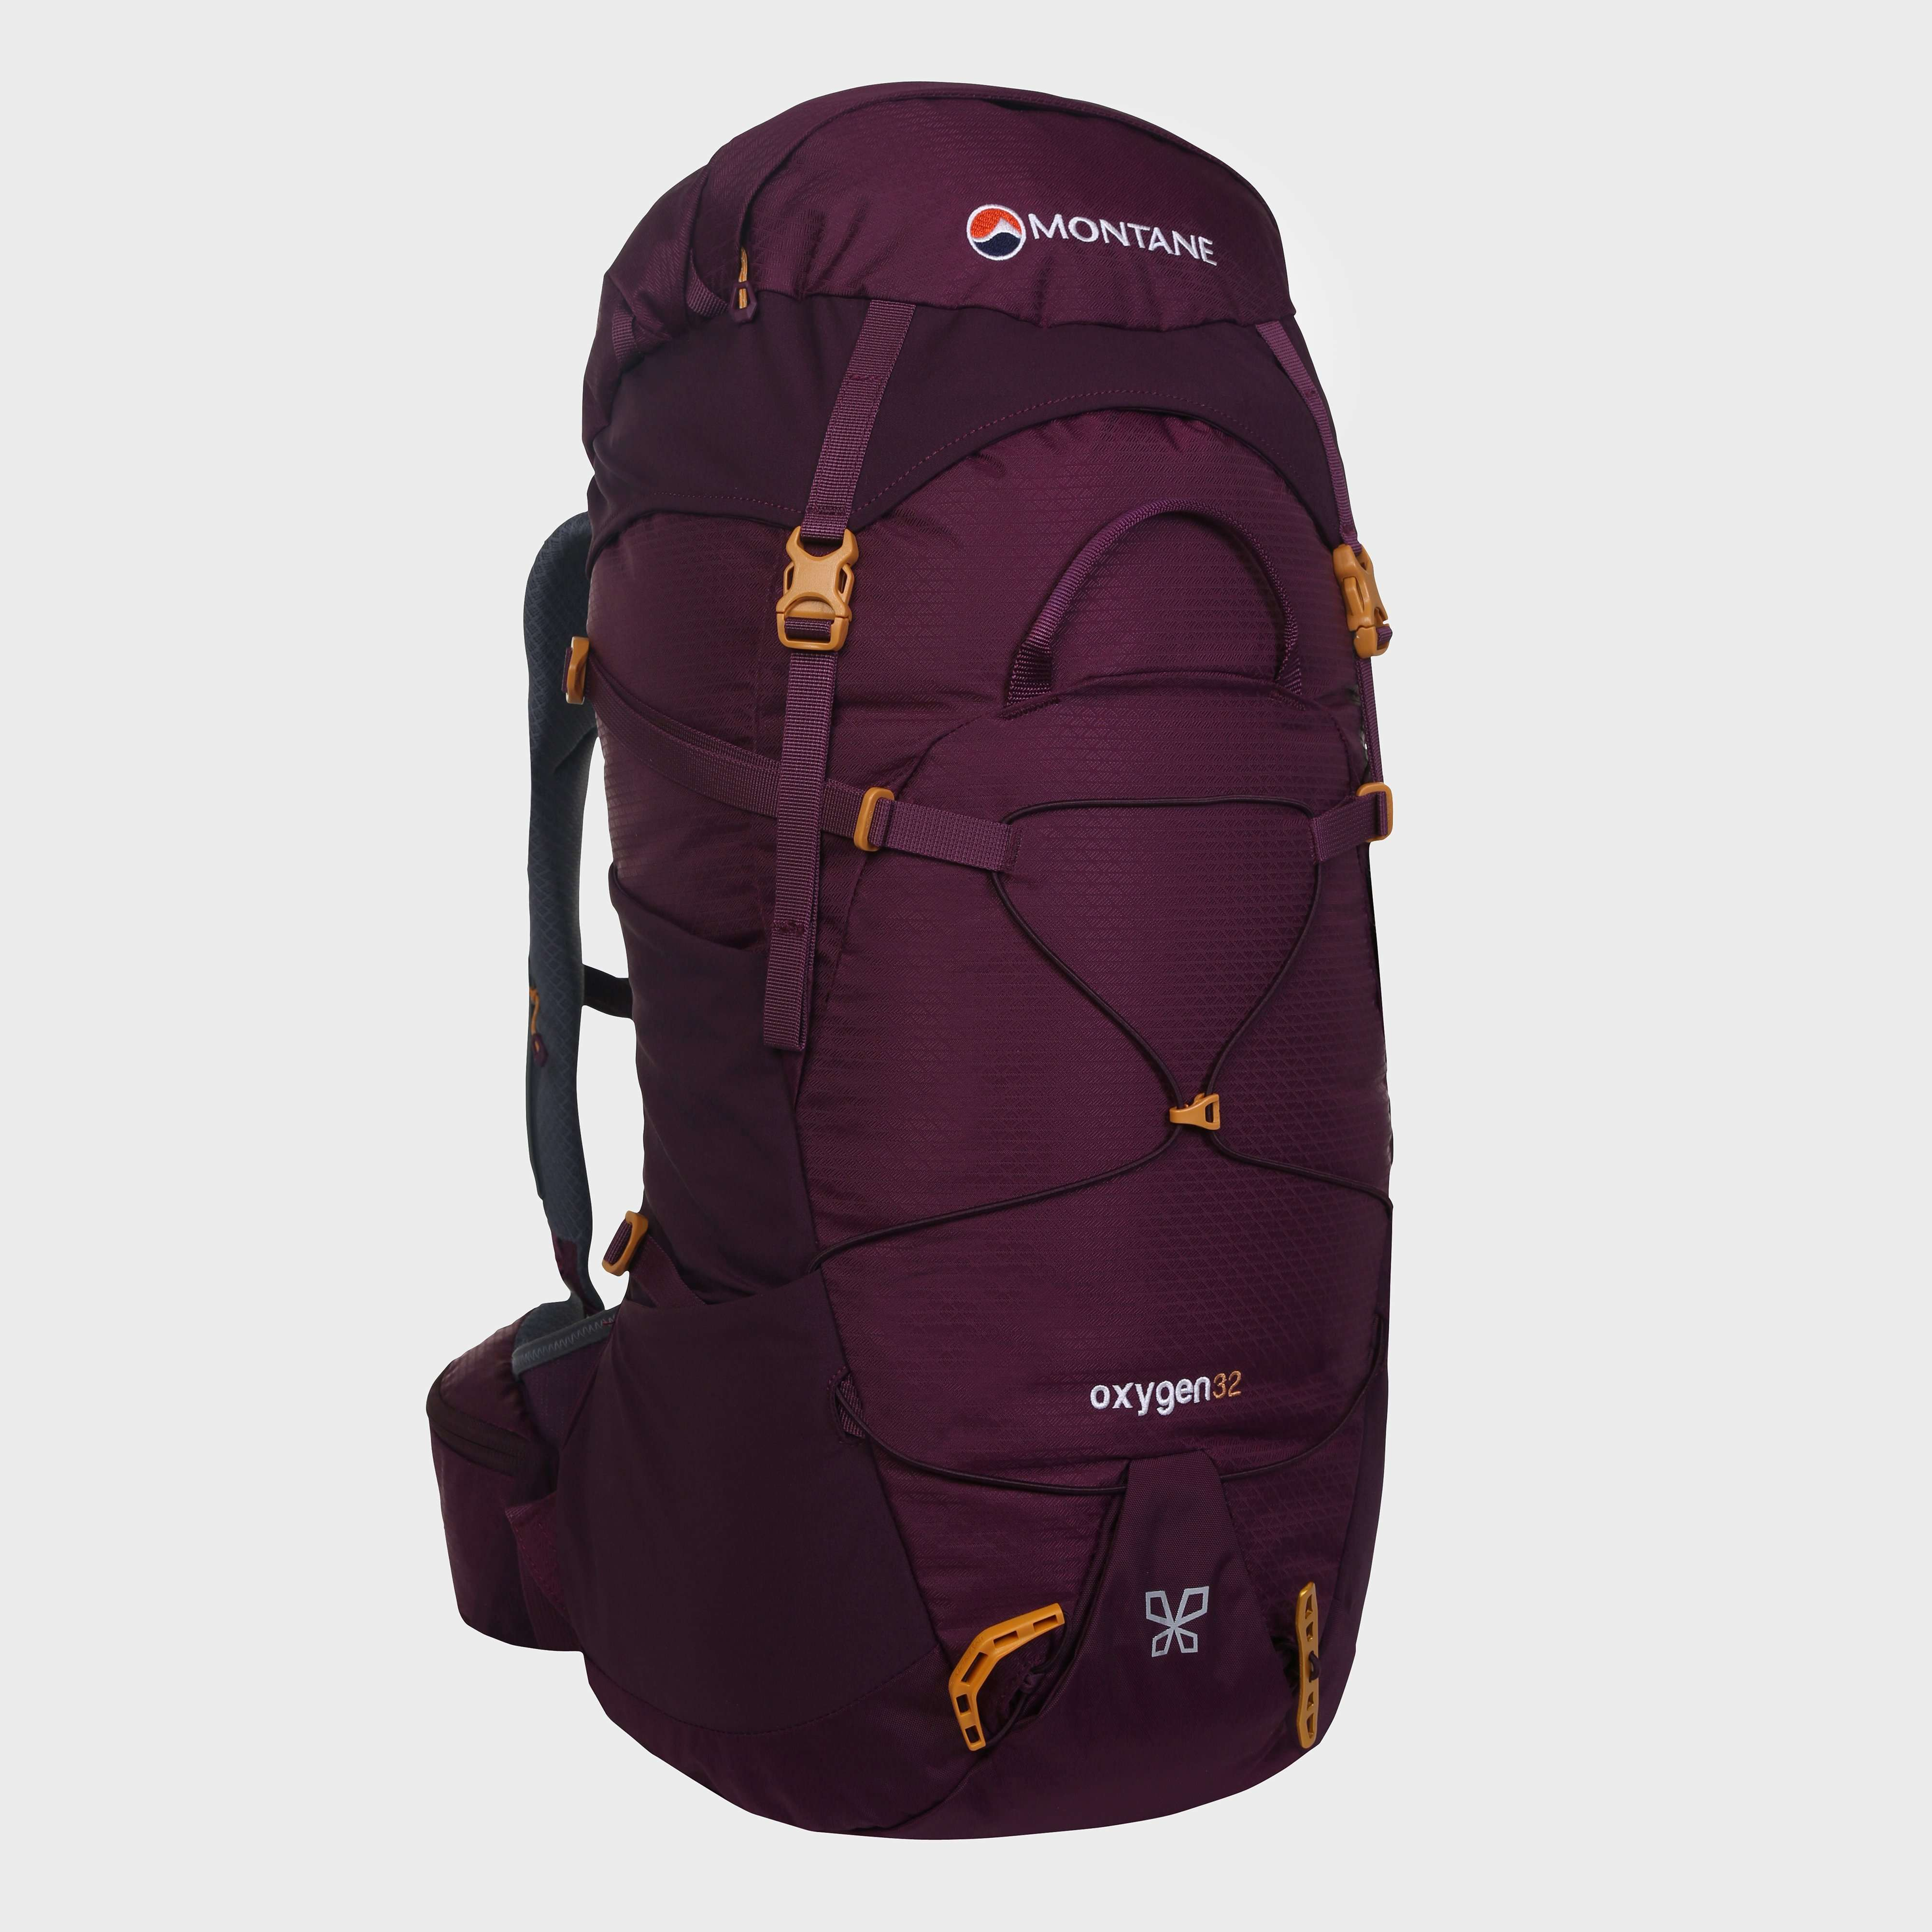 MONTANE Women's Oxygen 32 Daypack